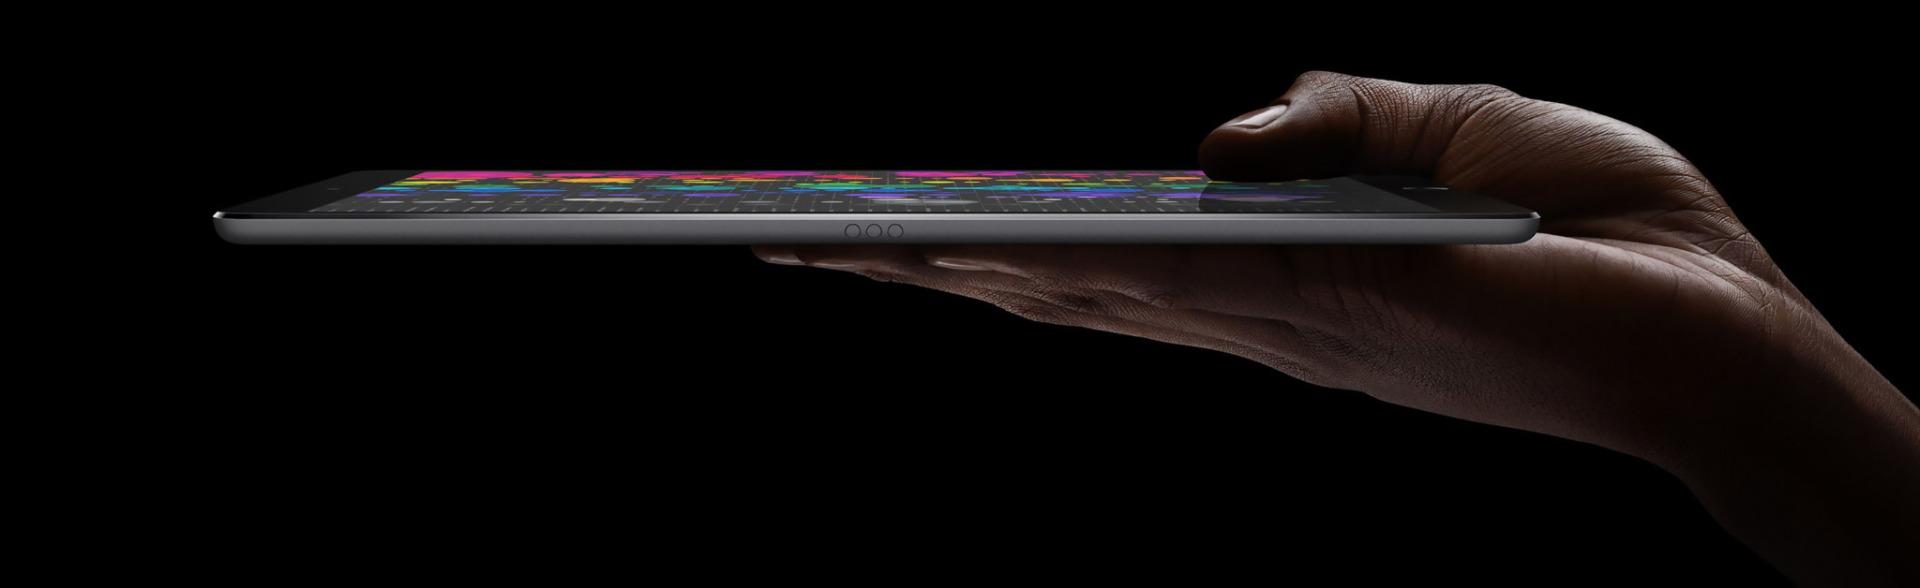 10.5″ iPad Pro test